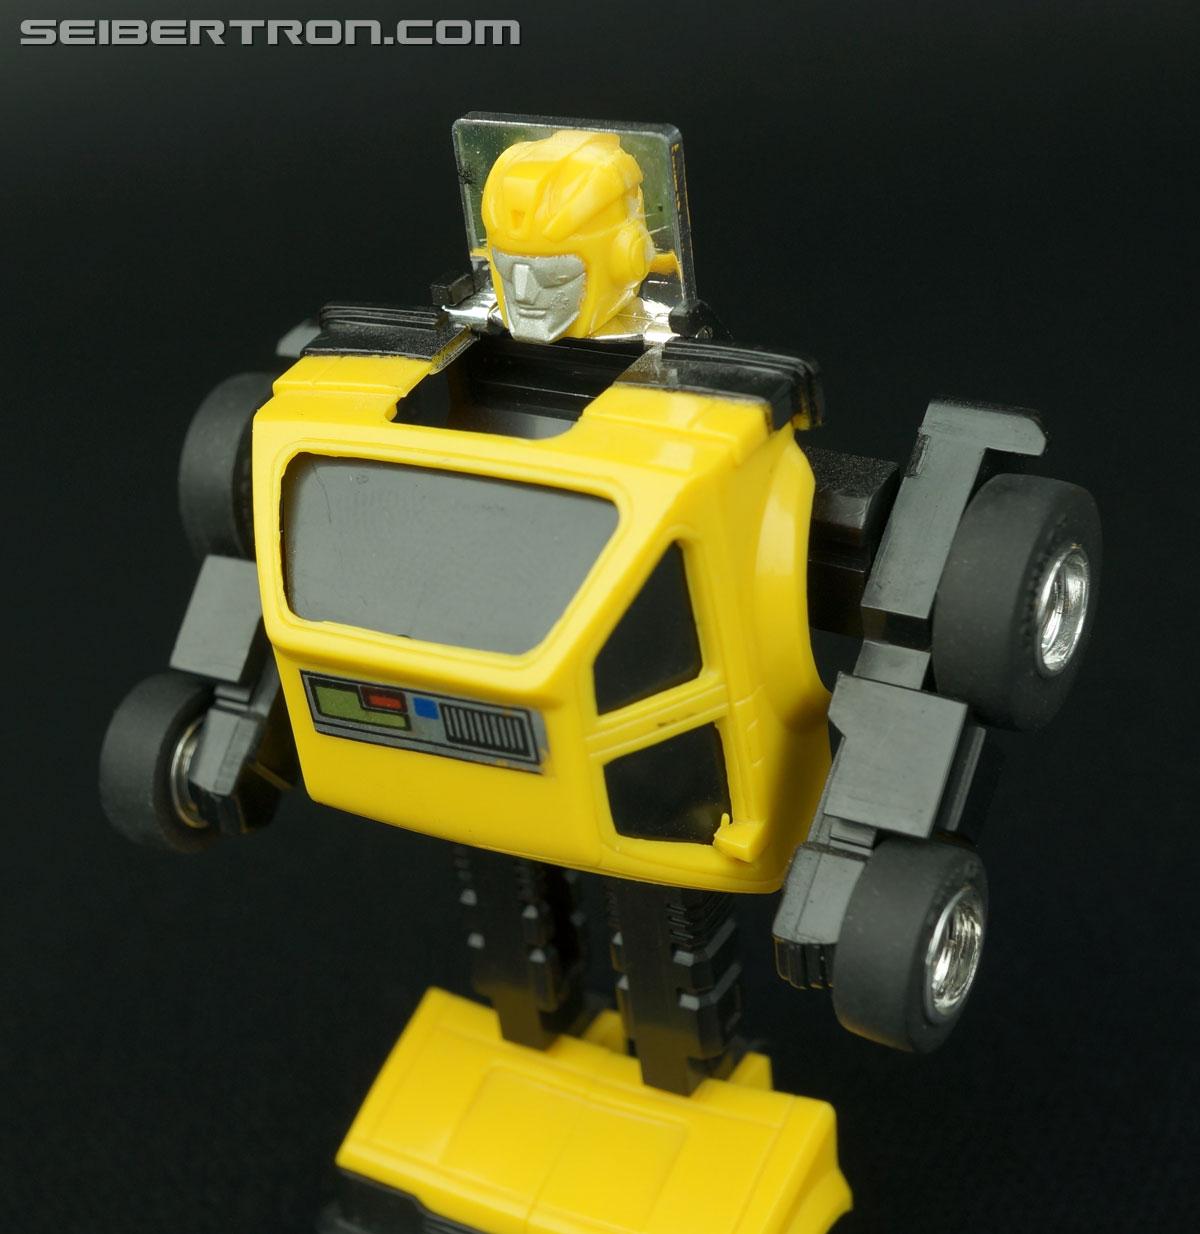 Transformers Micro Change MC04 Mini CAR Robo 02 XG1500 (Yellow) (Image #54 of 70)